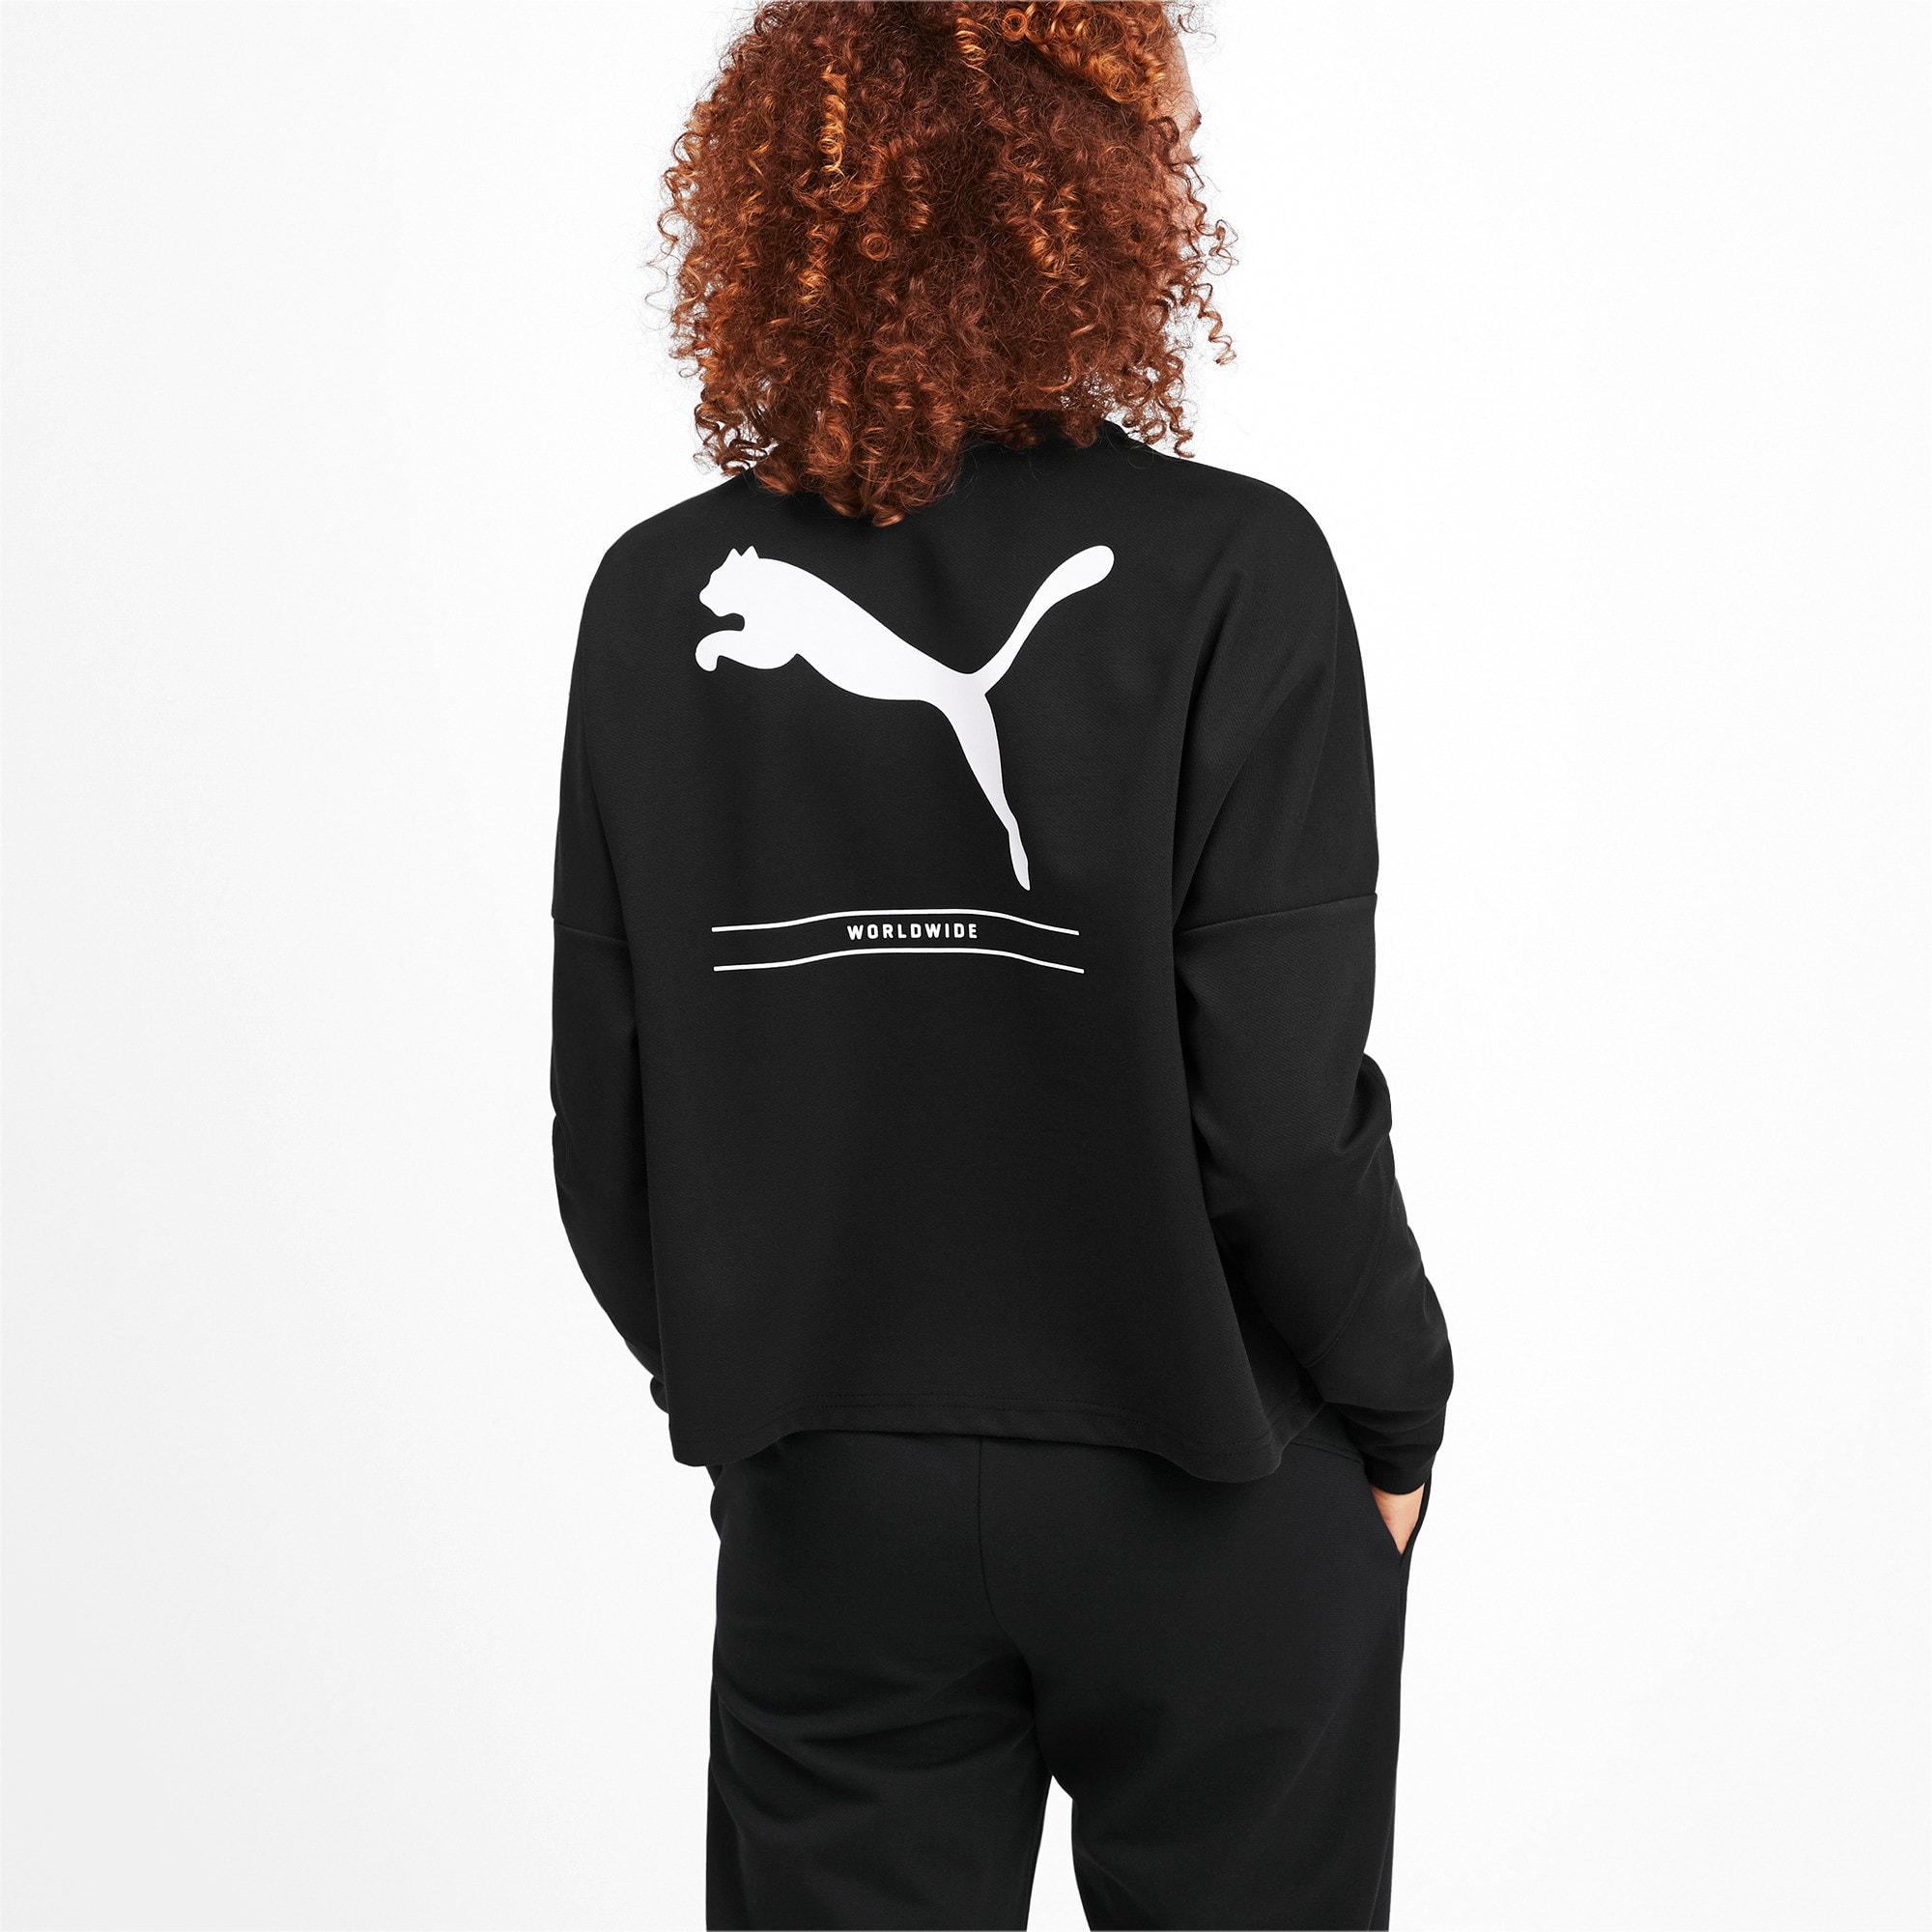 Thumbnail 2 of NU-TILITY Cropped Crew Women's Sweater, Puma Black, medium